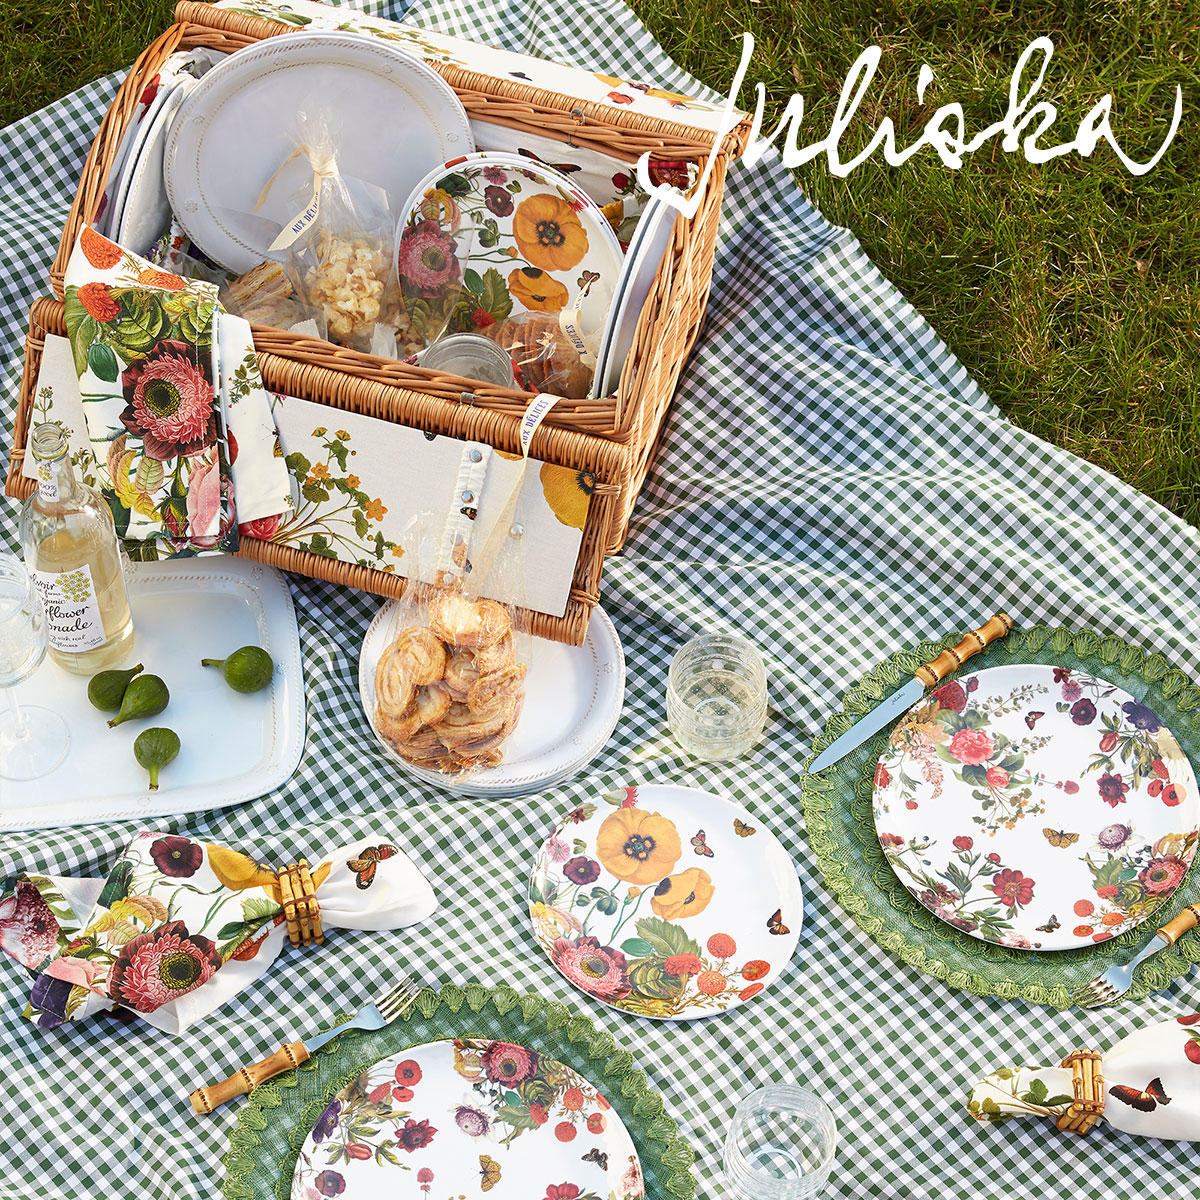 fof-picnic-2.jpg